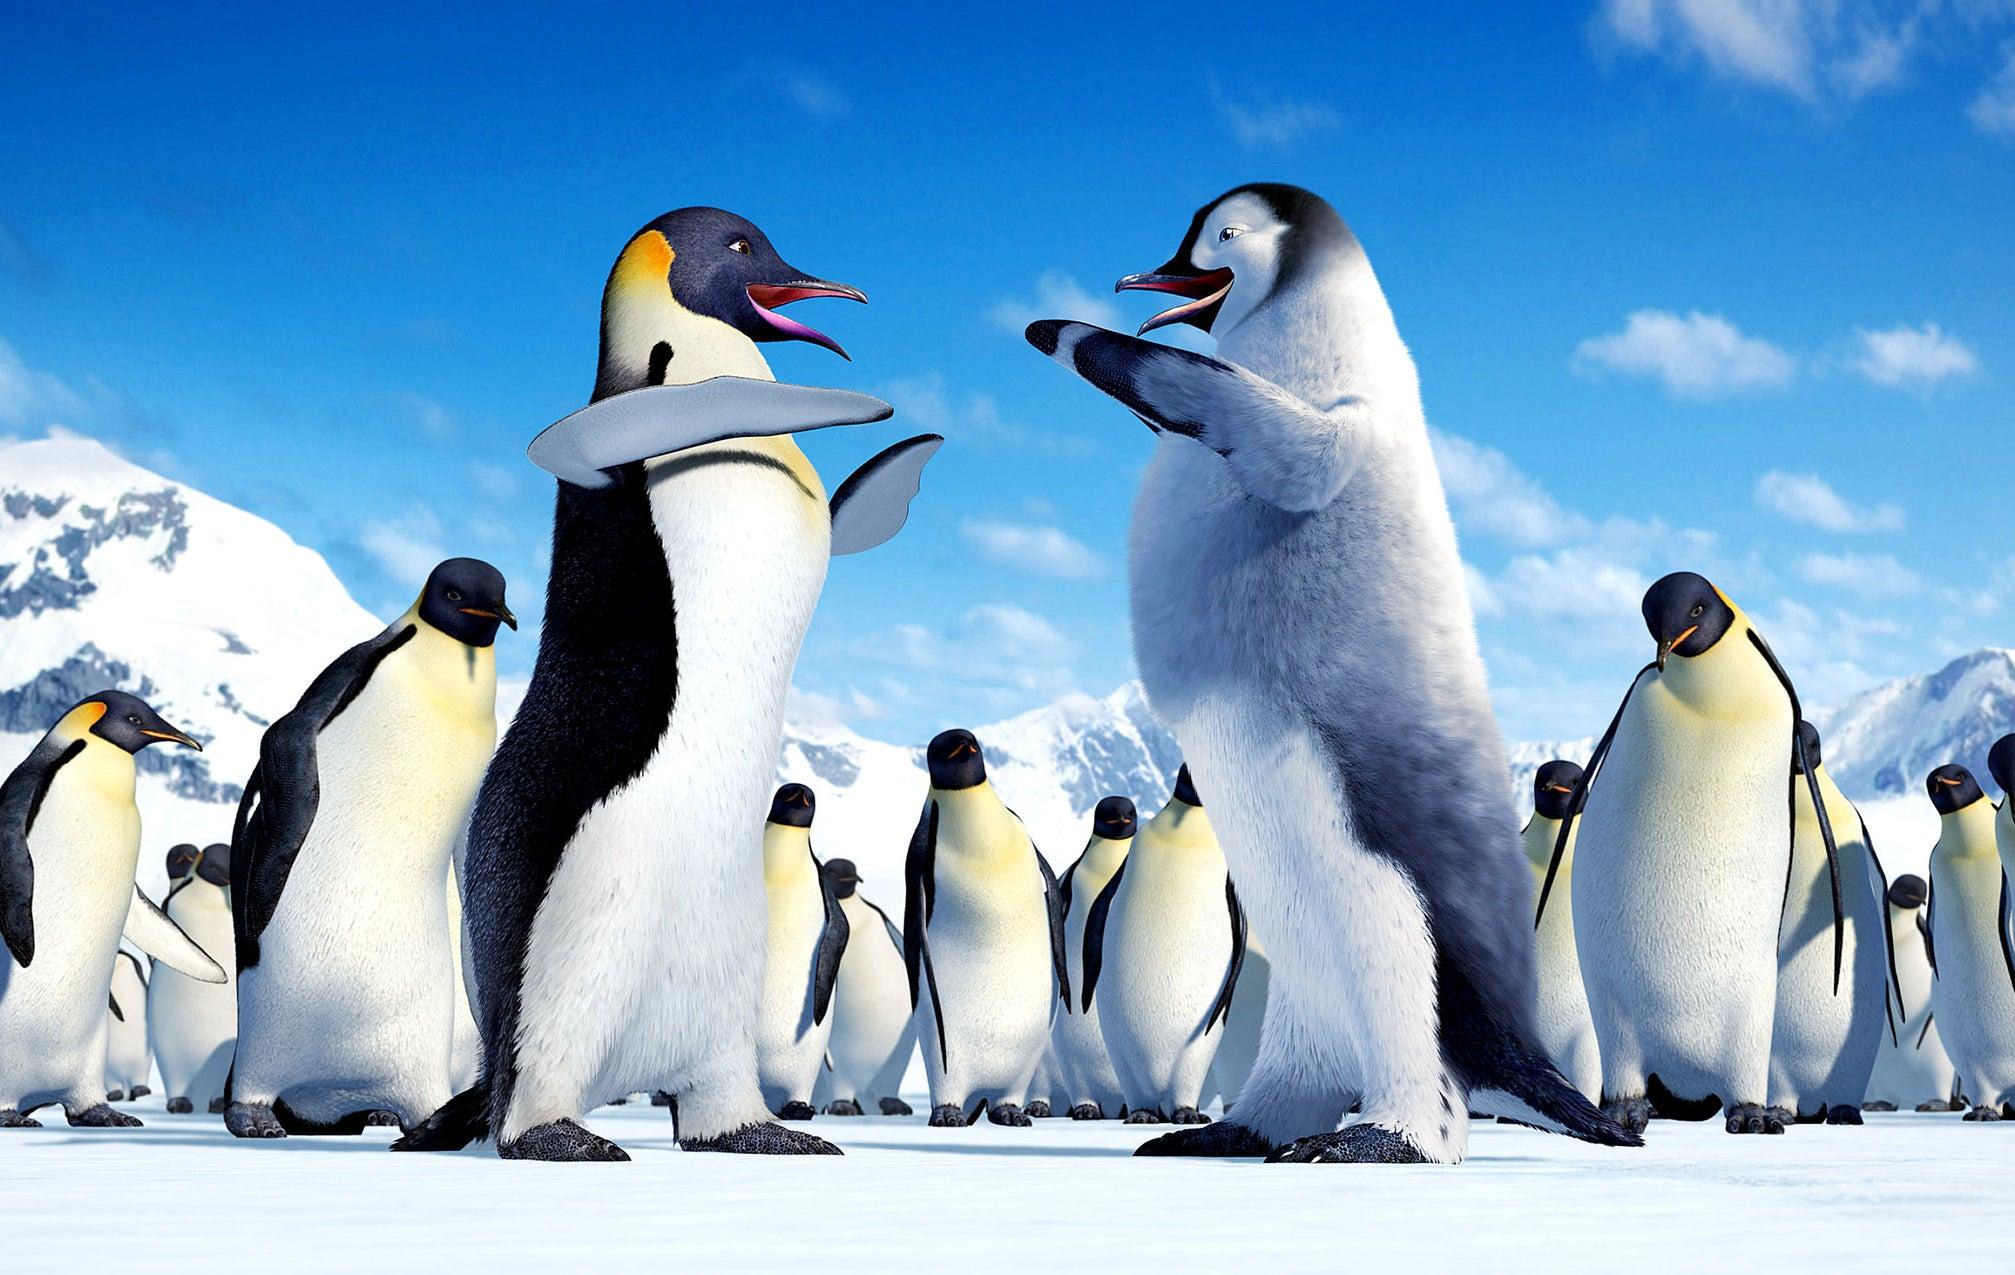 Dancing penguins